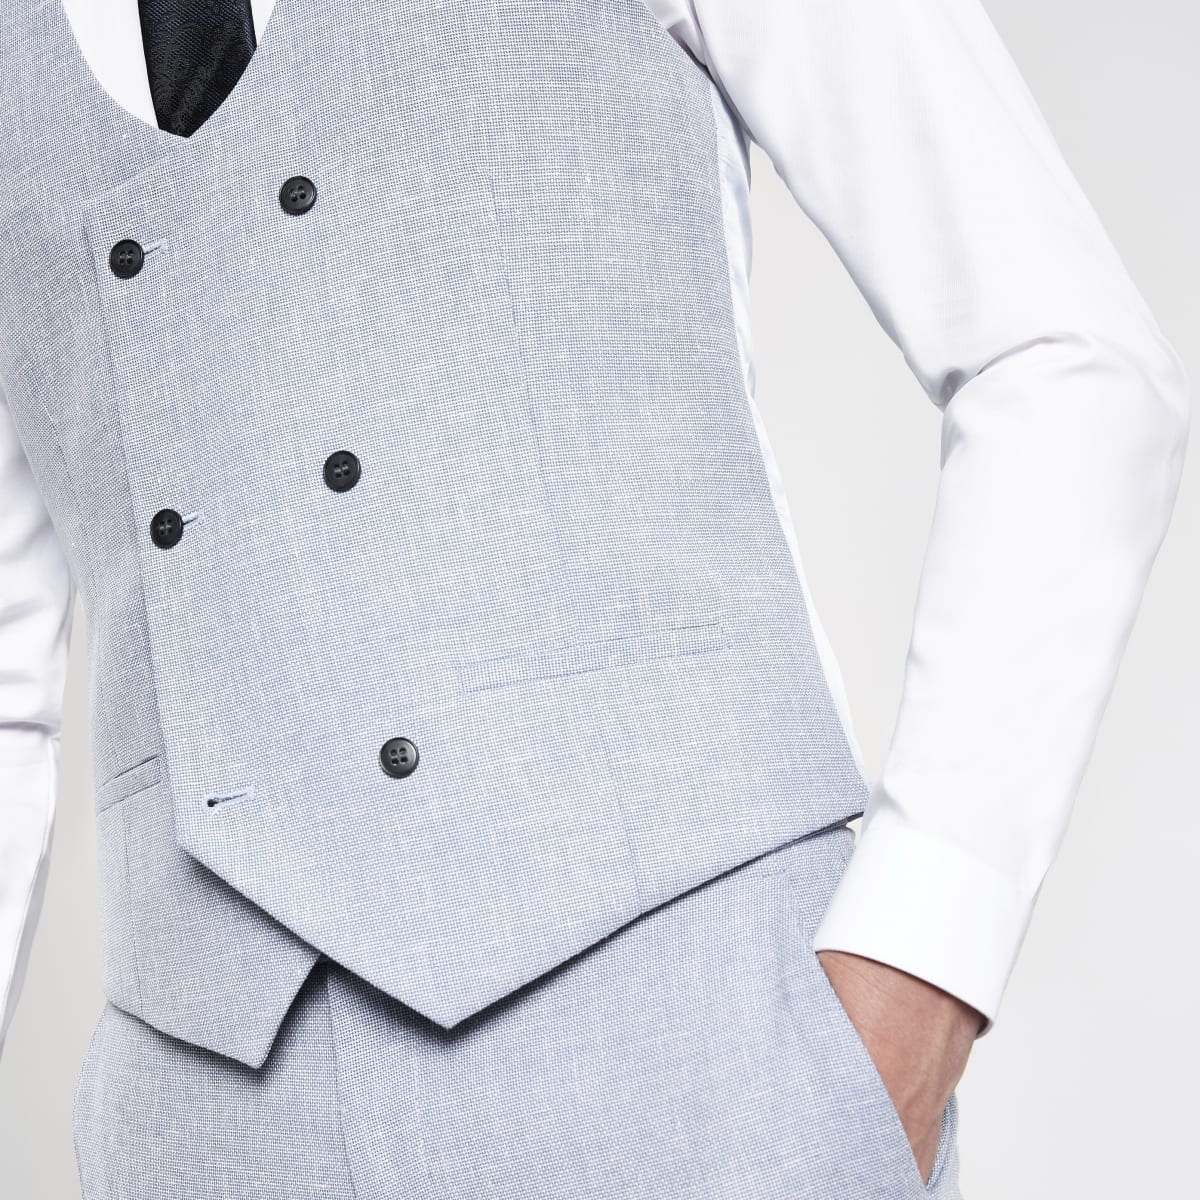 Gilet de costume bleu clair